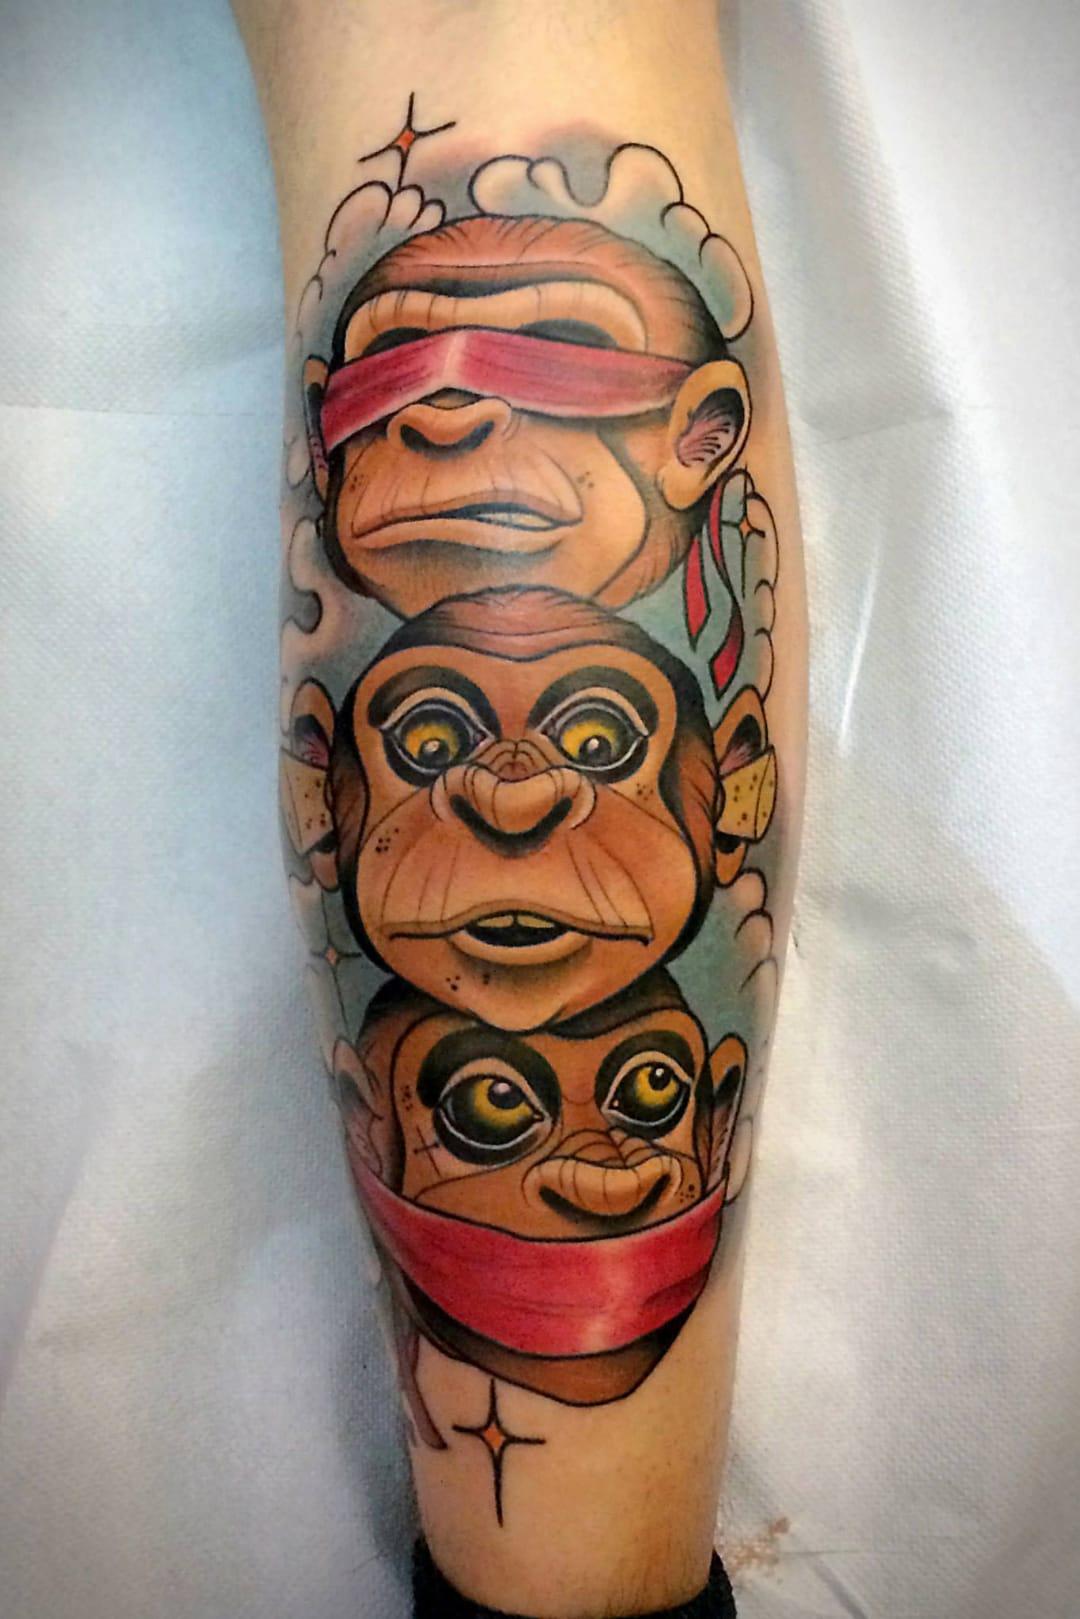 Os Três Macacos Sábios #FulvioVaccarone #macacotattoo #monkeytattoo #macaco #monkey #tresmacacossabios #ThreeMonkeys #rolha #stopper